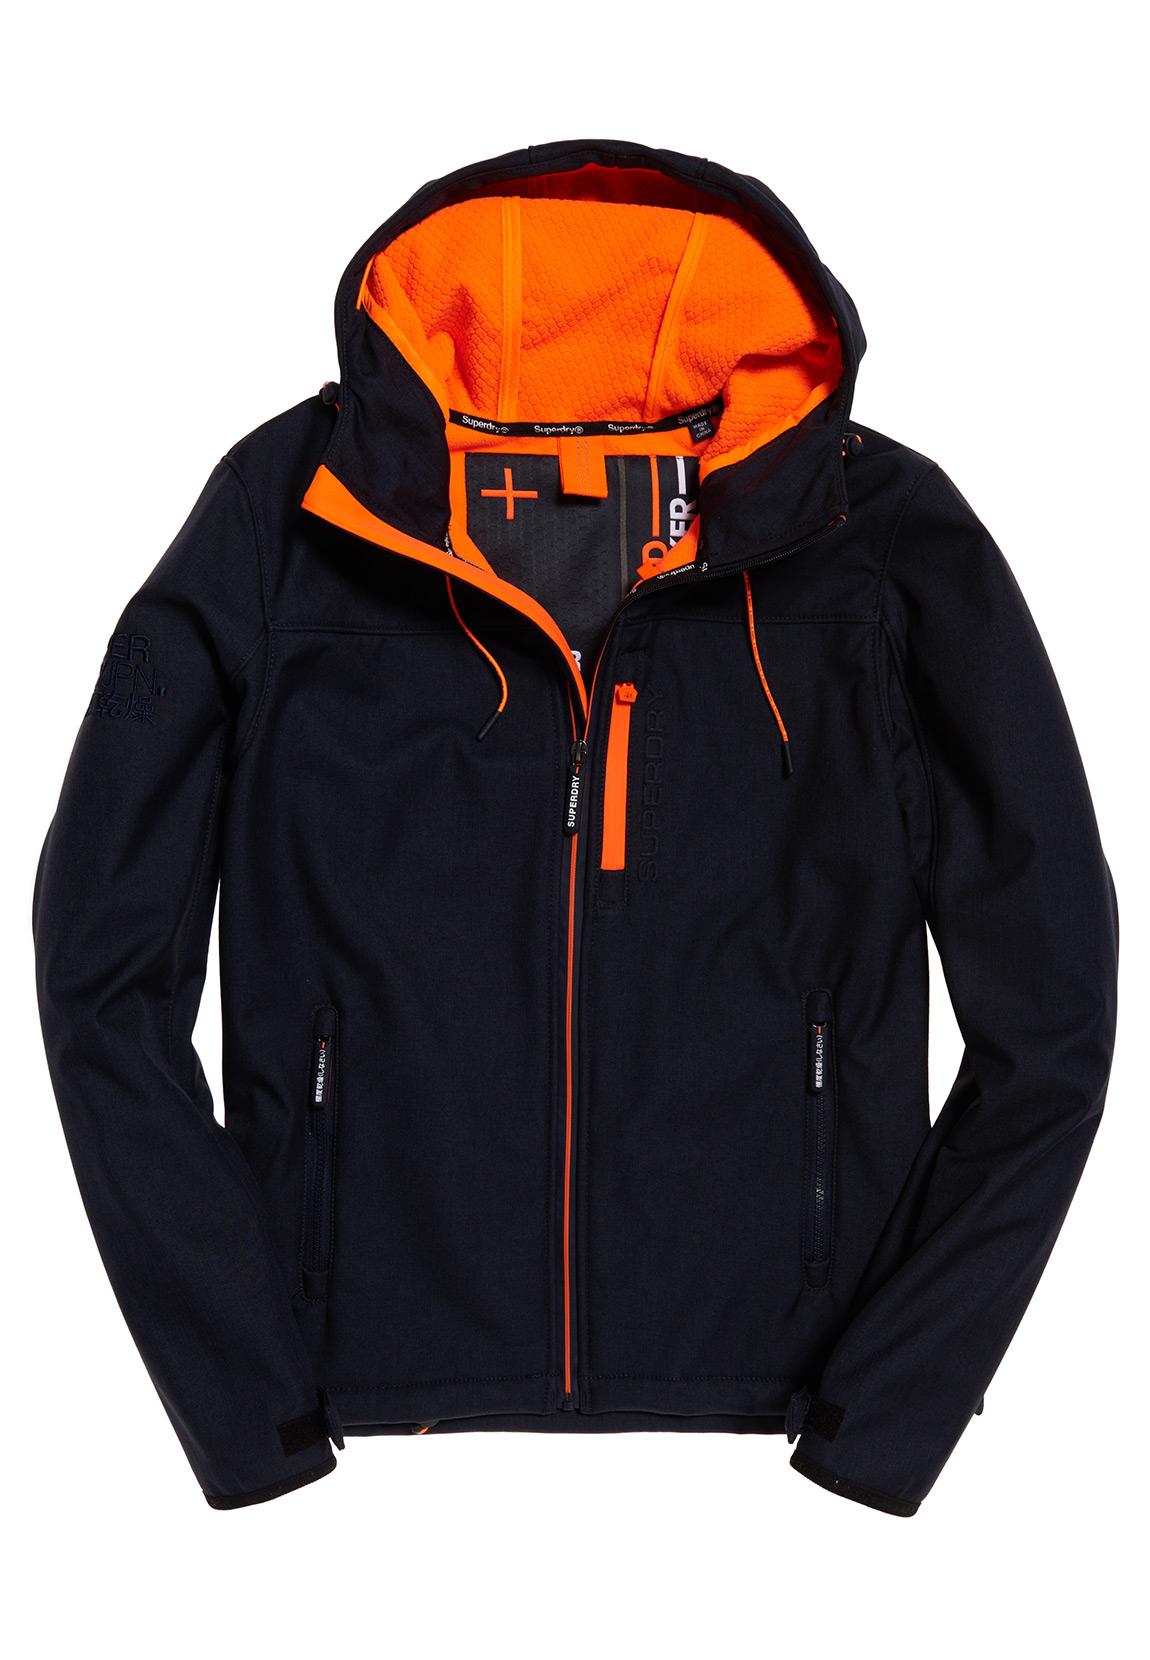 save off 5a3b9 3e2bb Superdry Jacke Herren HOODED WINDTREKKER Deep Navy/Lazer Orange